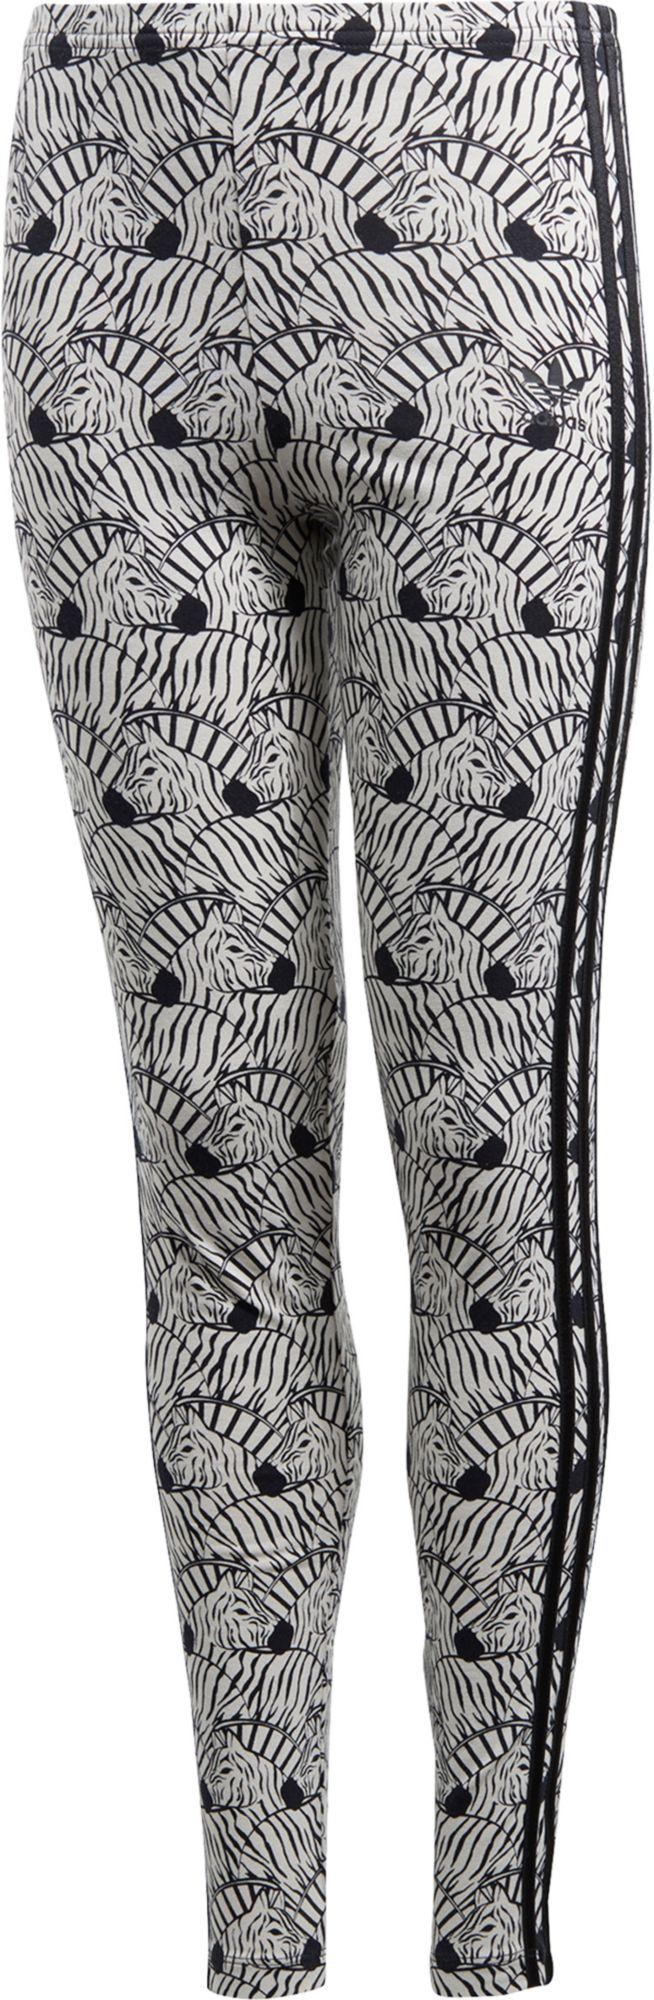 20de95418f7 adidas Originals Girls' Zebra Leggings | Products | Zebra leggings ...